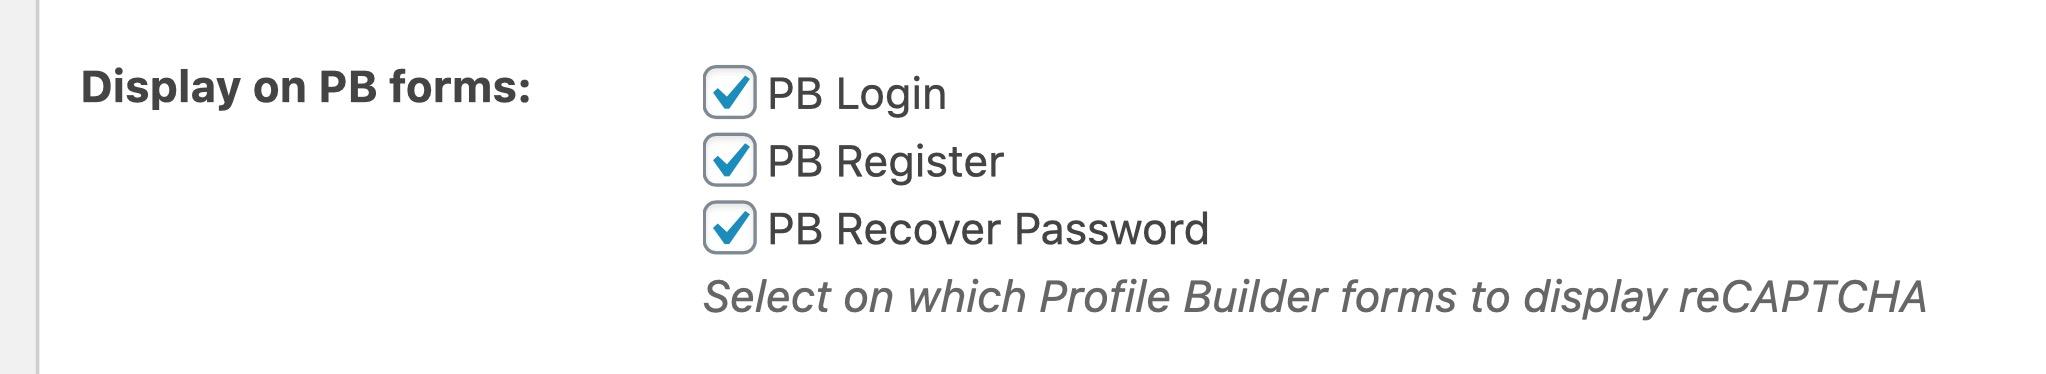 check the PB login option for ReCaptcha